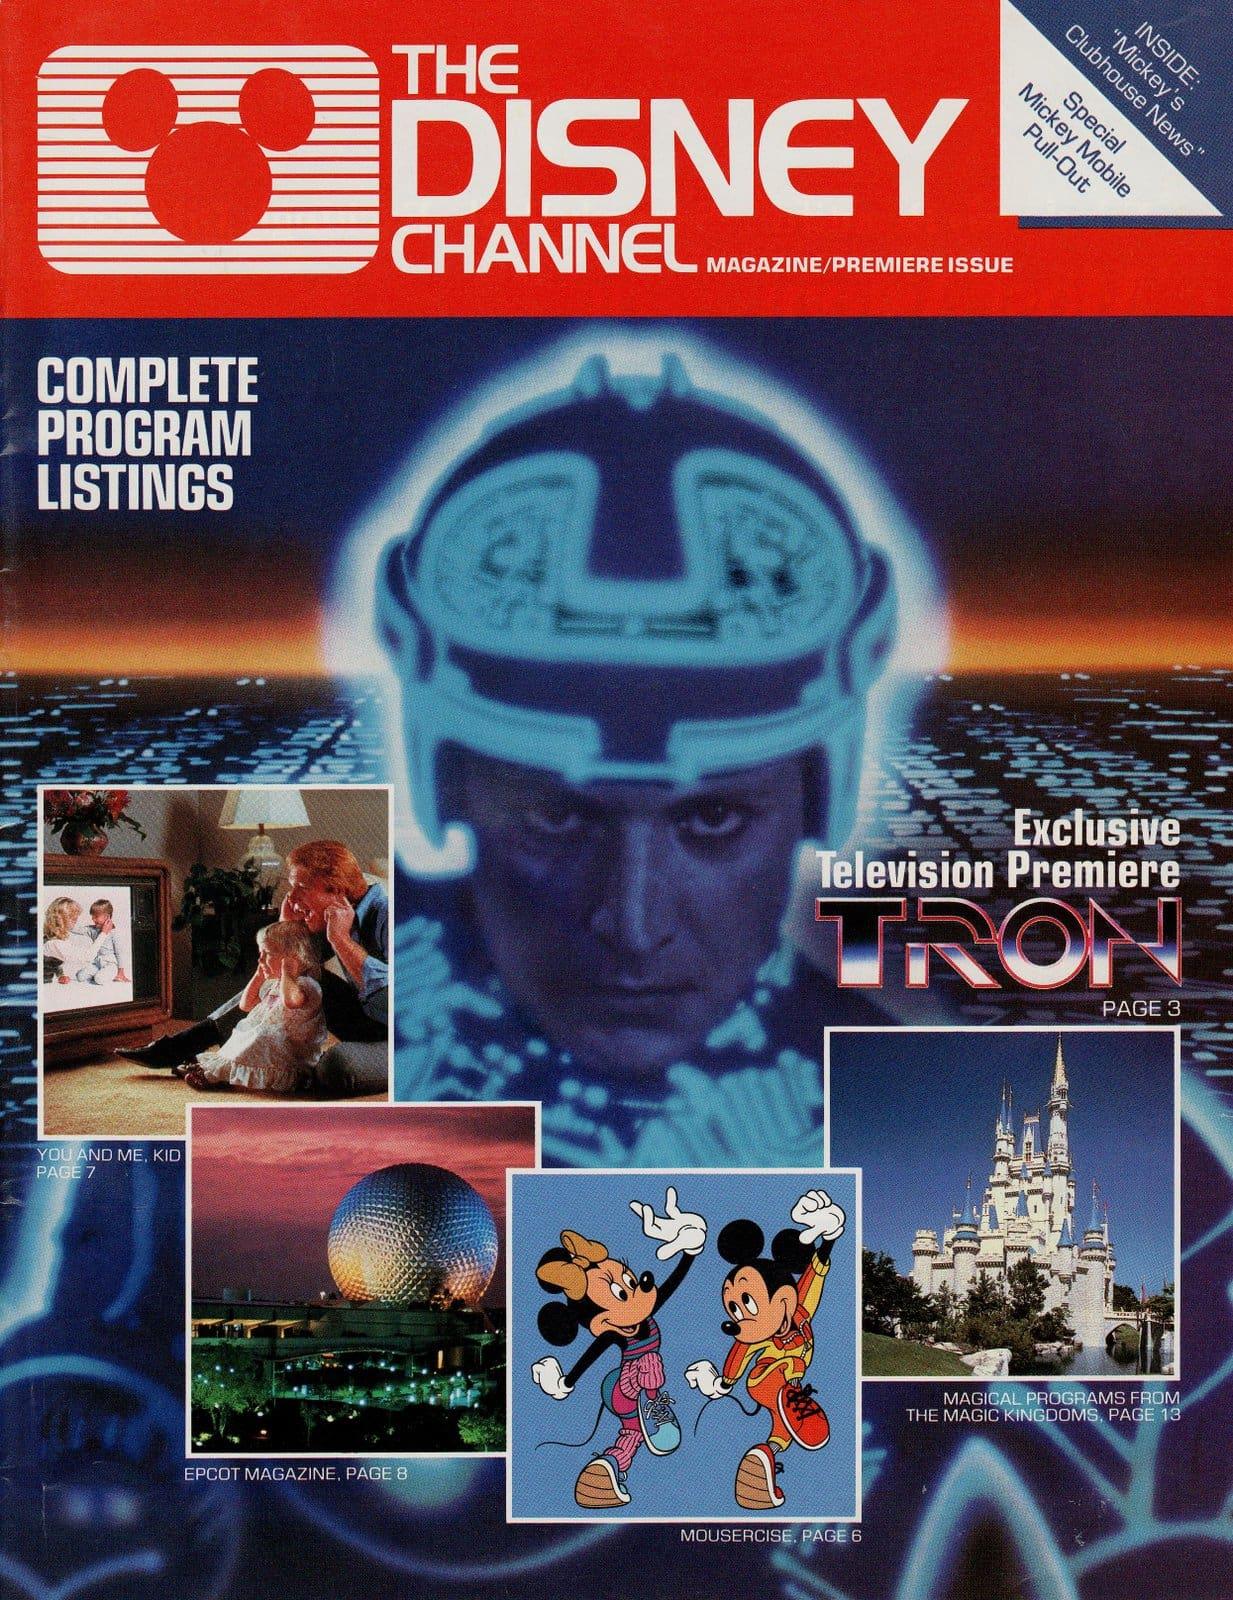 Disney Channel Magazine No 1 - April-May 1983